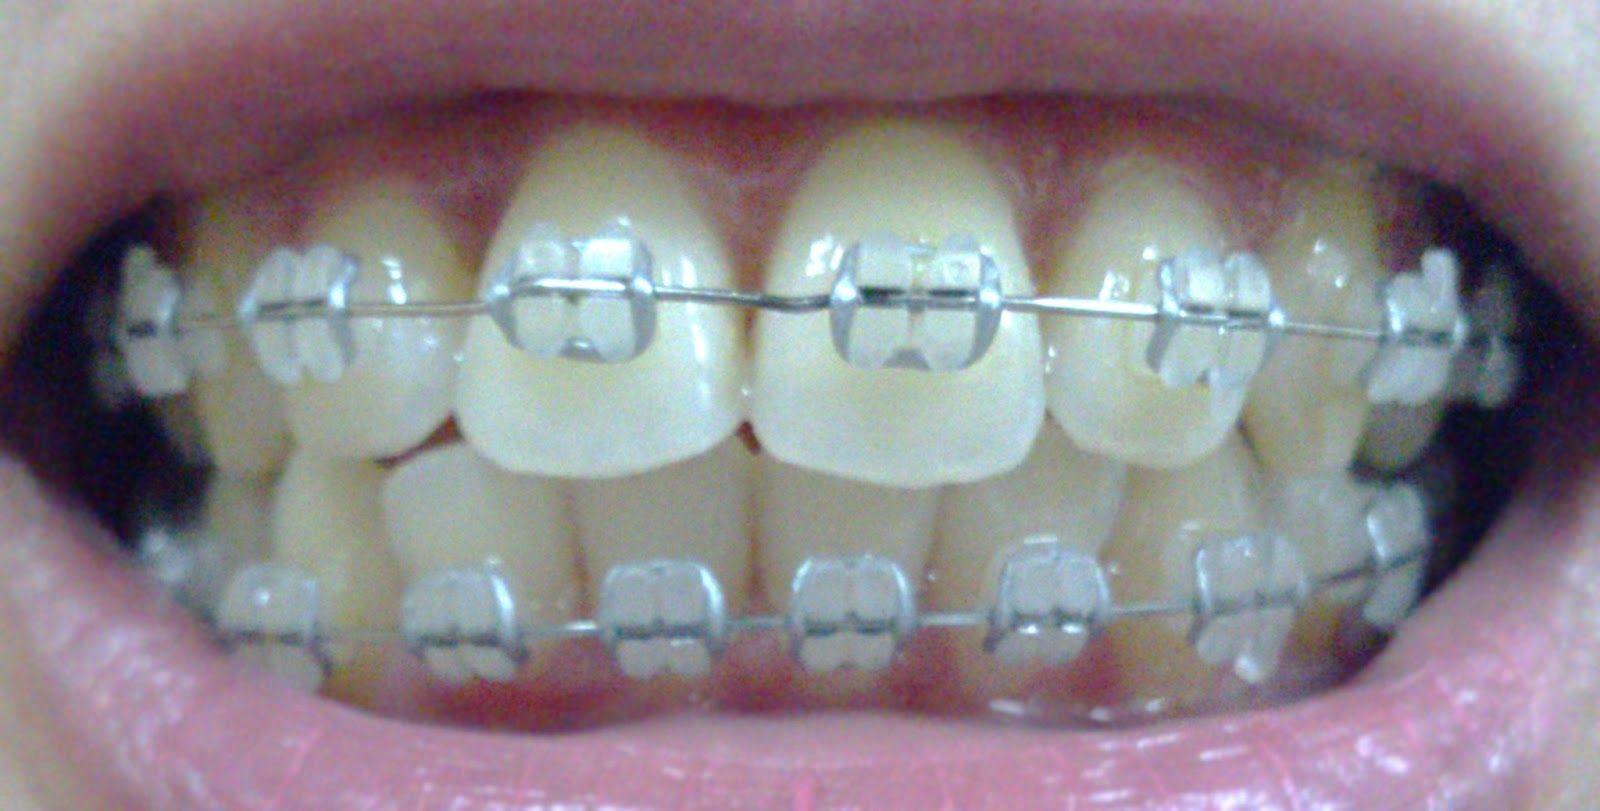 Rubber Bands Braces Diagram Taco Valve Wiring Ceramic 43braces 43gray 43bands Photo Taken 05 Jan 2013